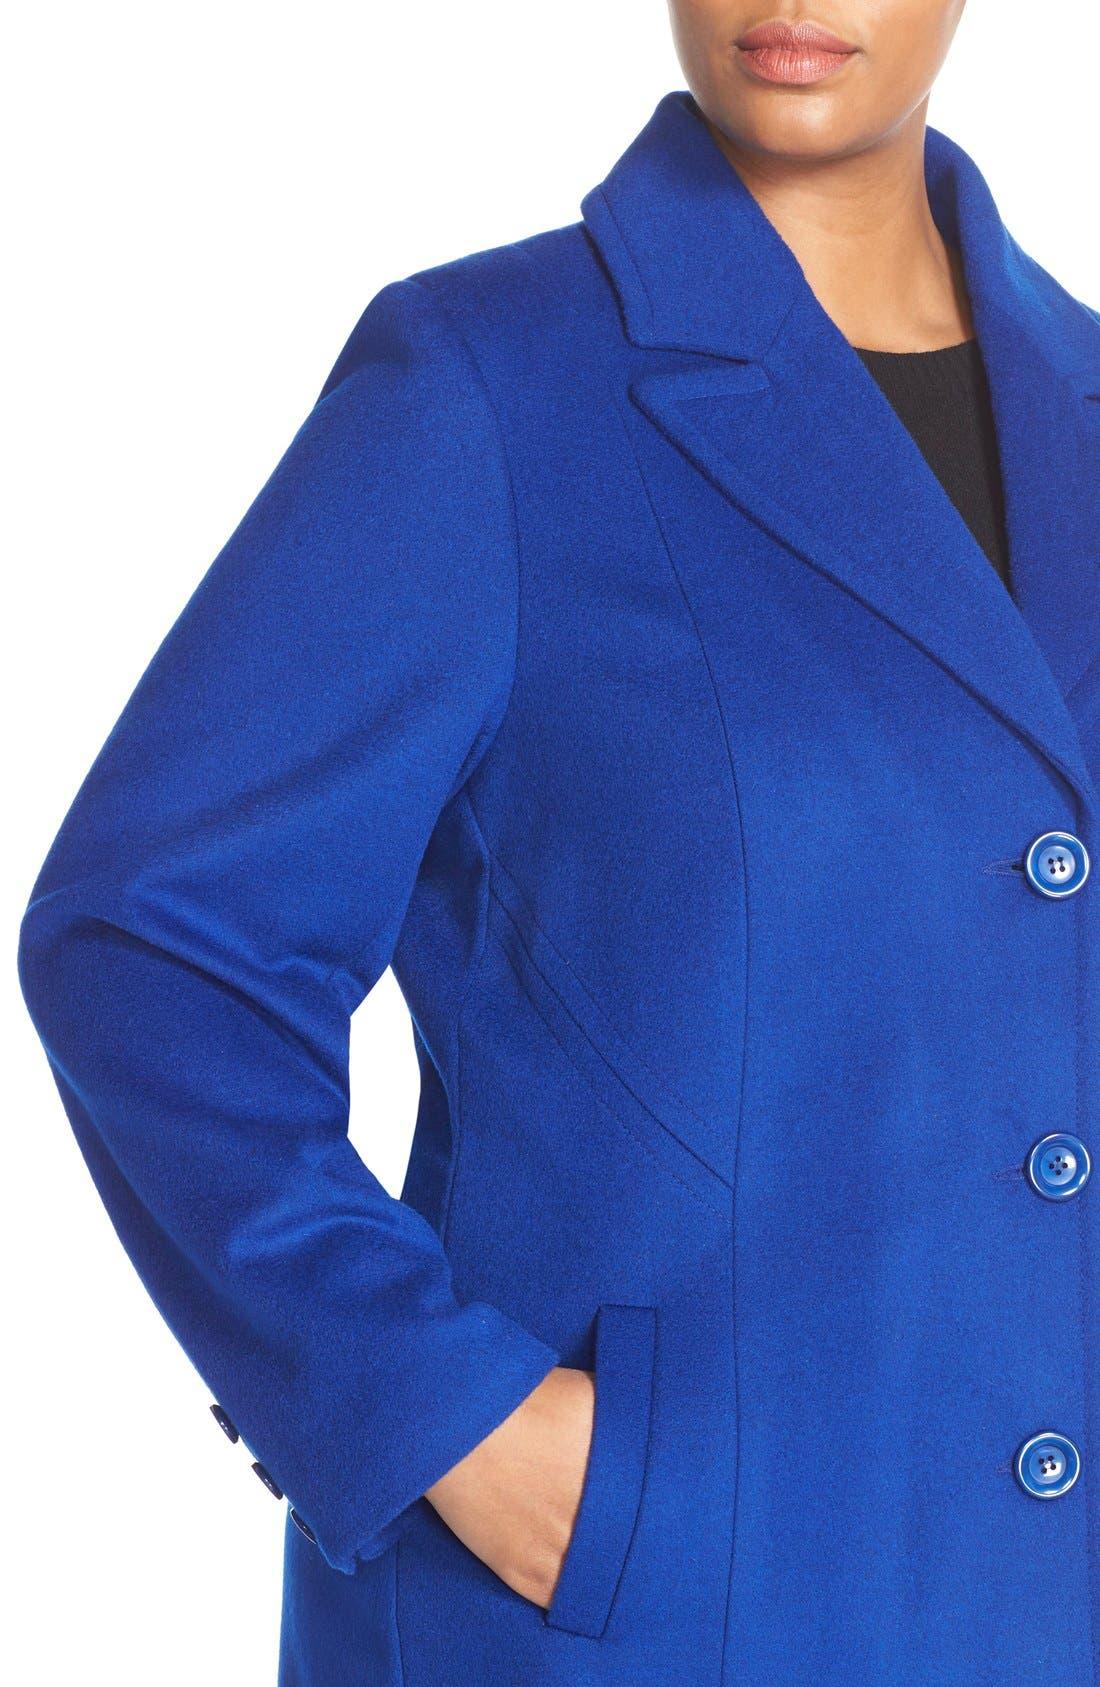 Notch Collar Wool Blend Coat,                             Alternate thumbnail 2, color,                             COBALT